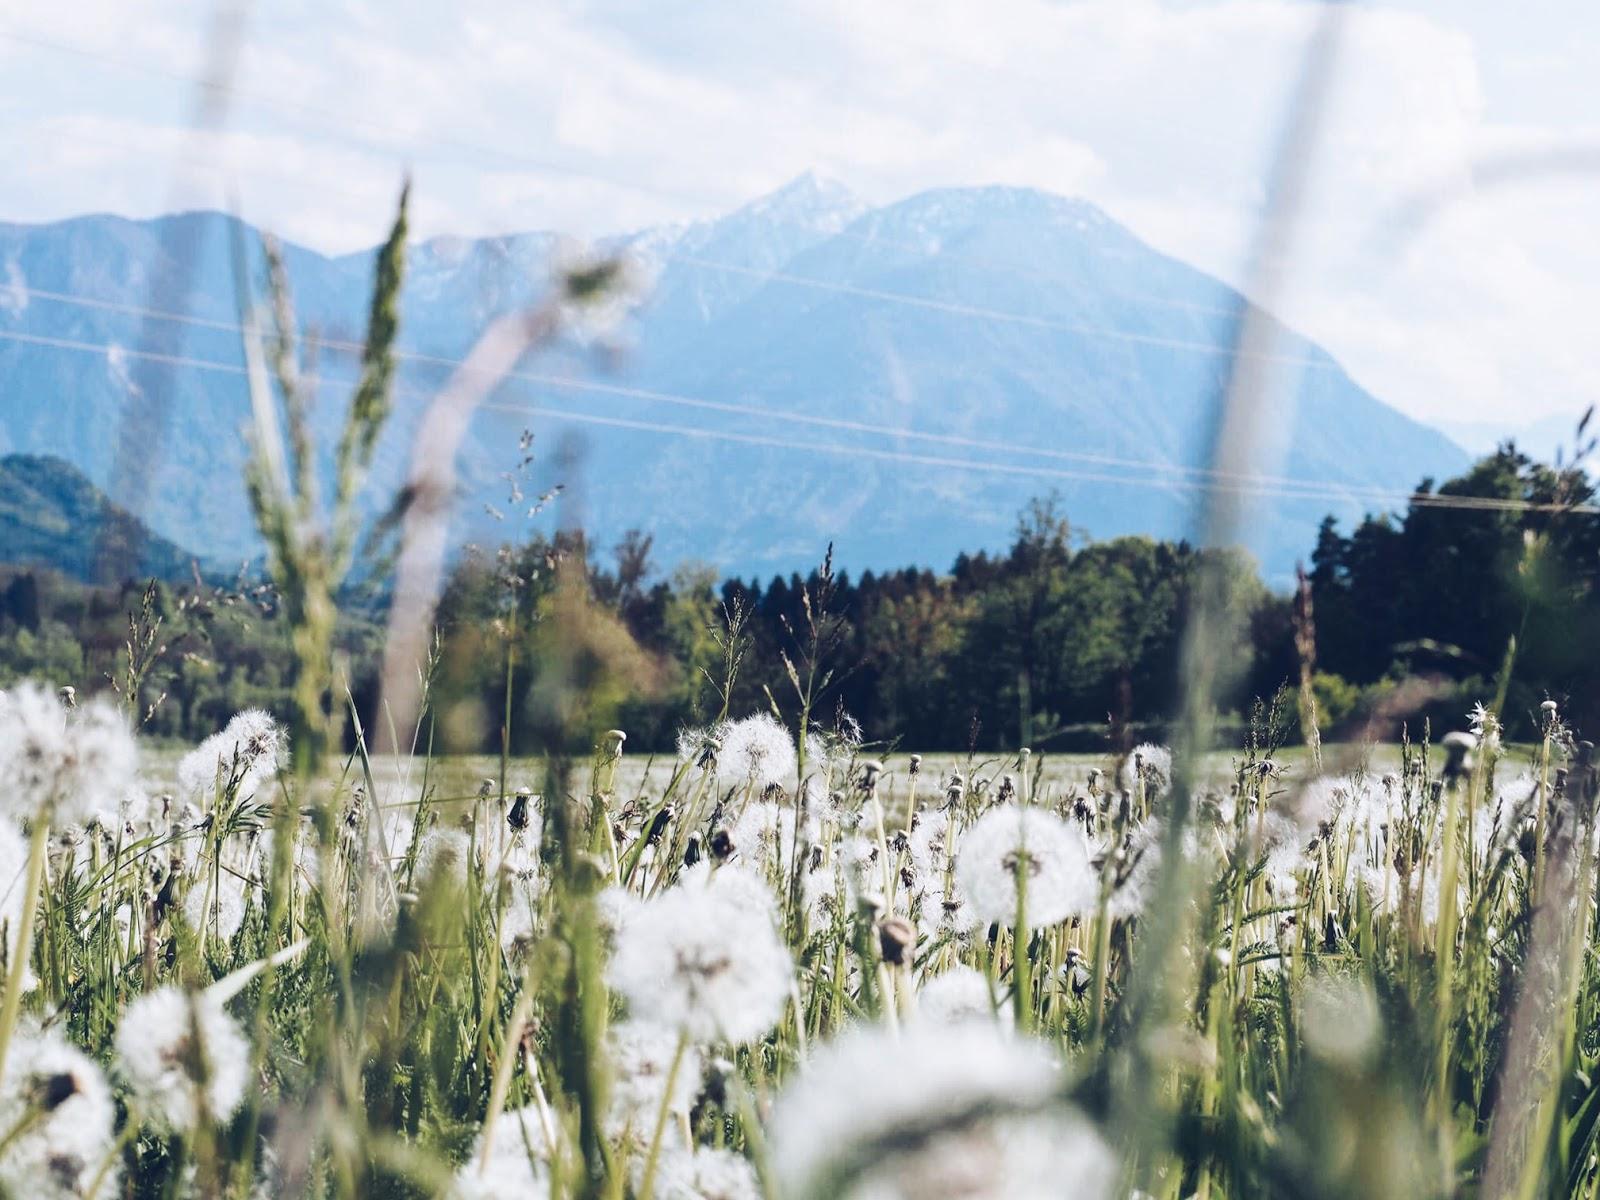 Tainach podróże góry Graz